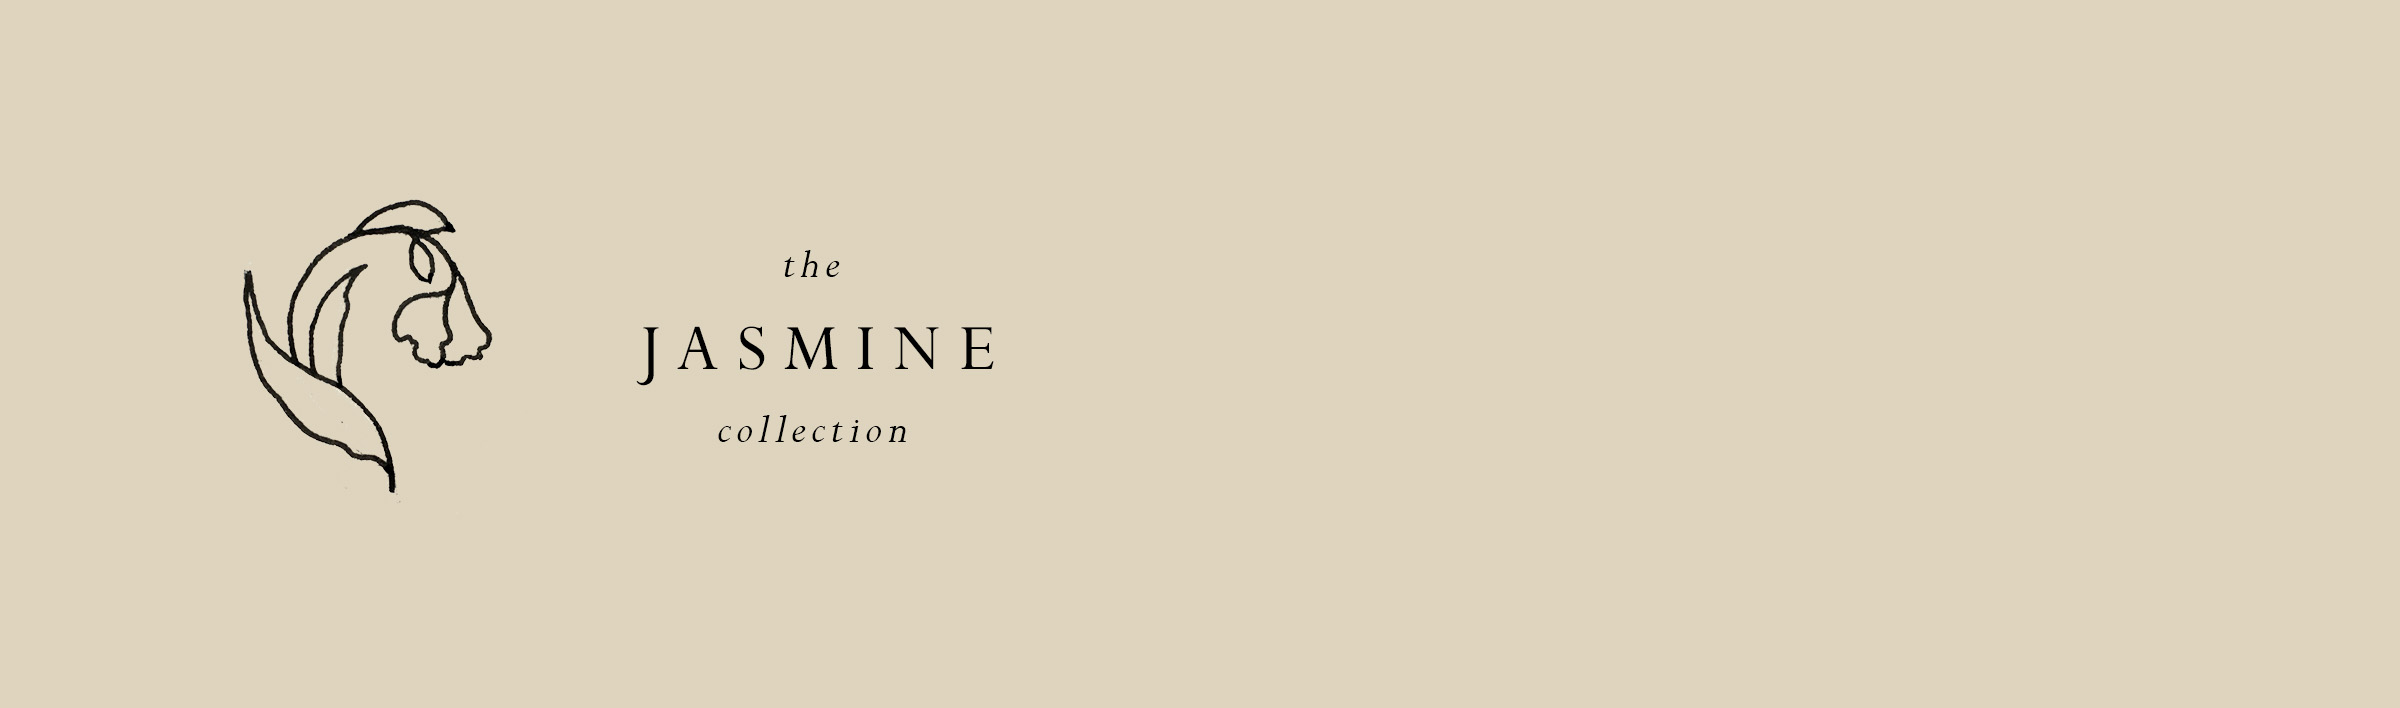 jasmine_banner3.jpg